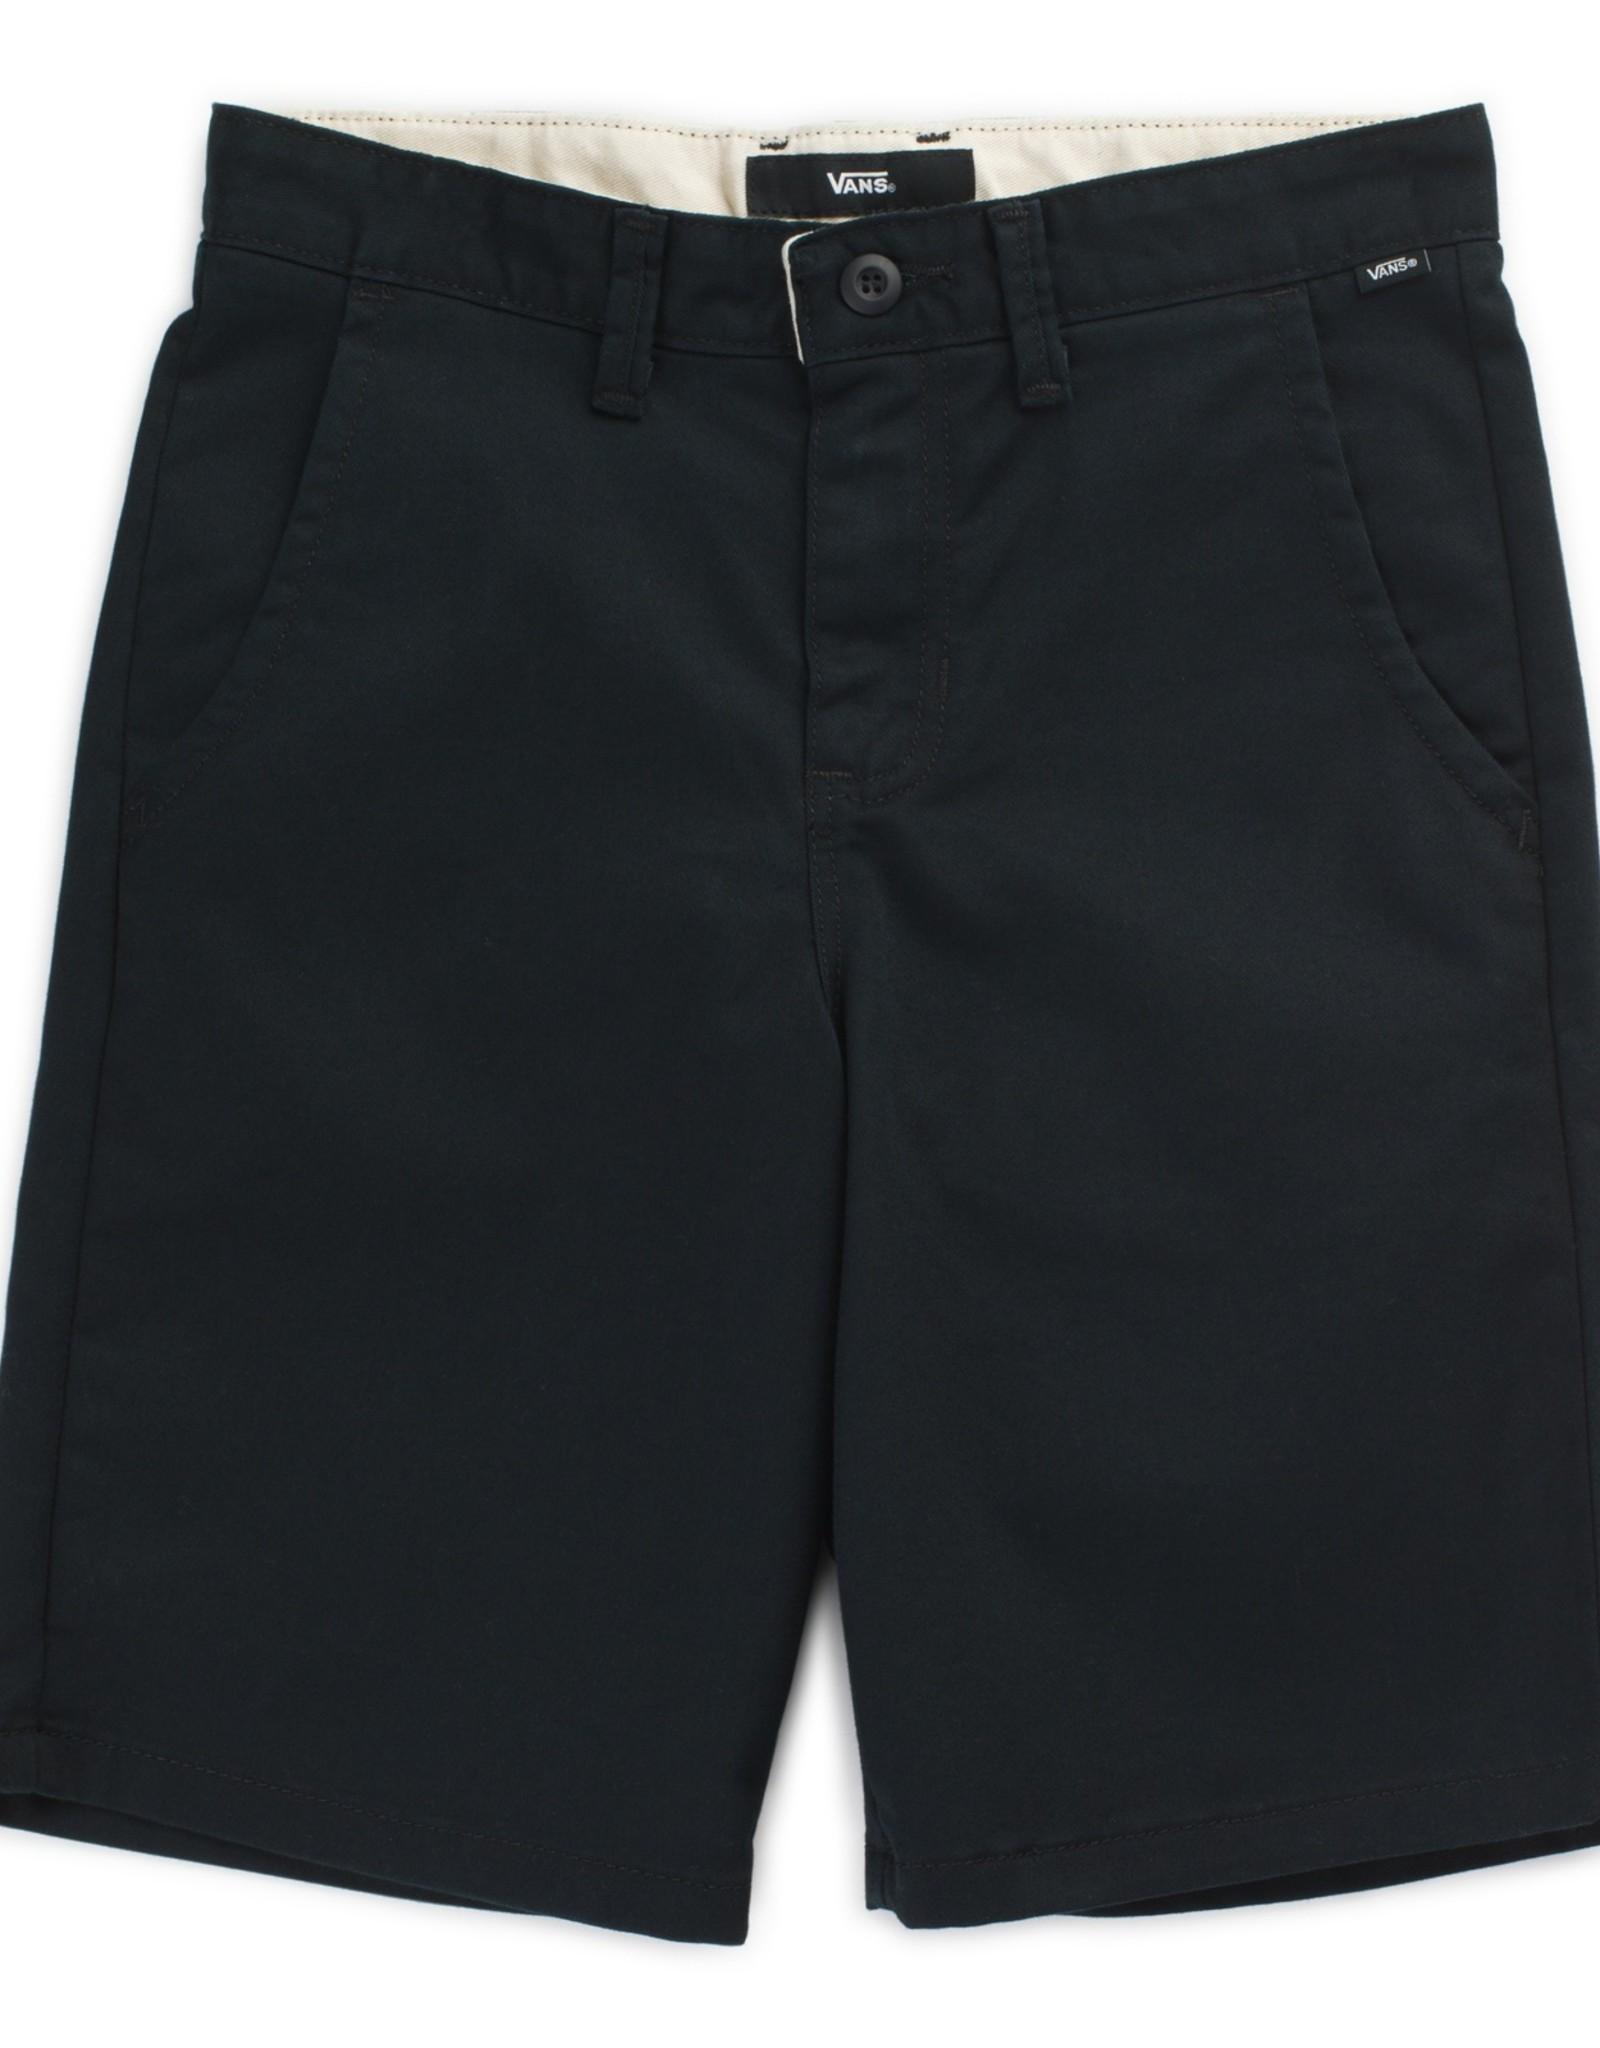 Vans SP21 YthB Black Auth Stretch Shorts